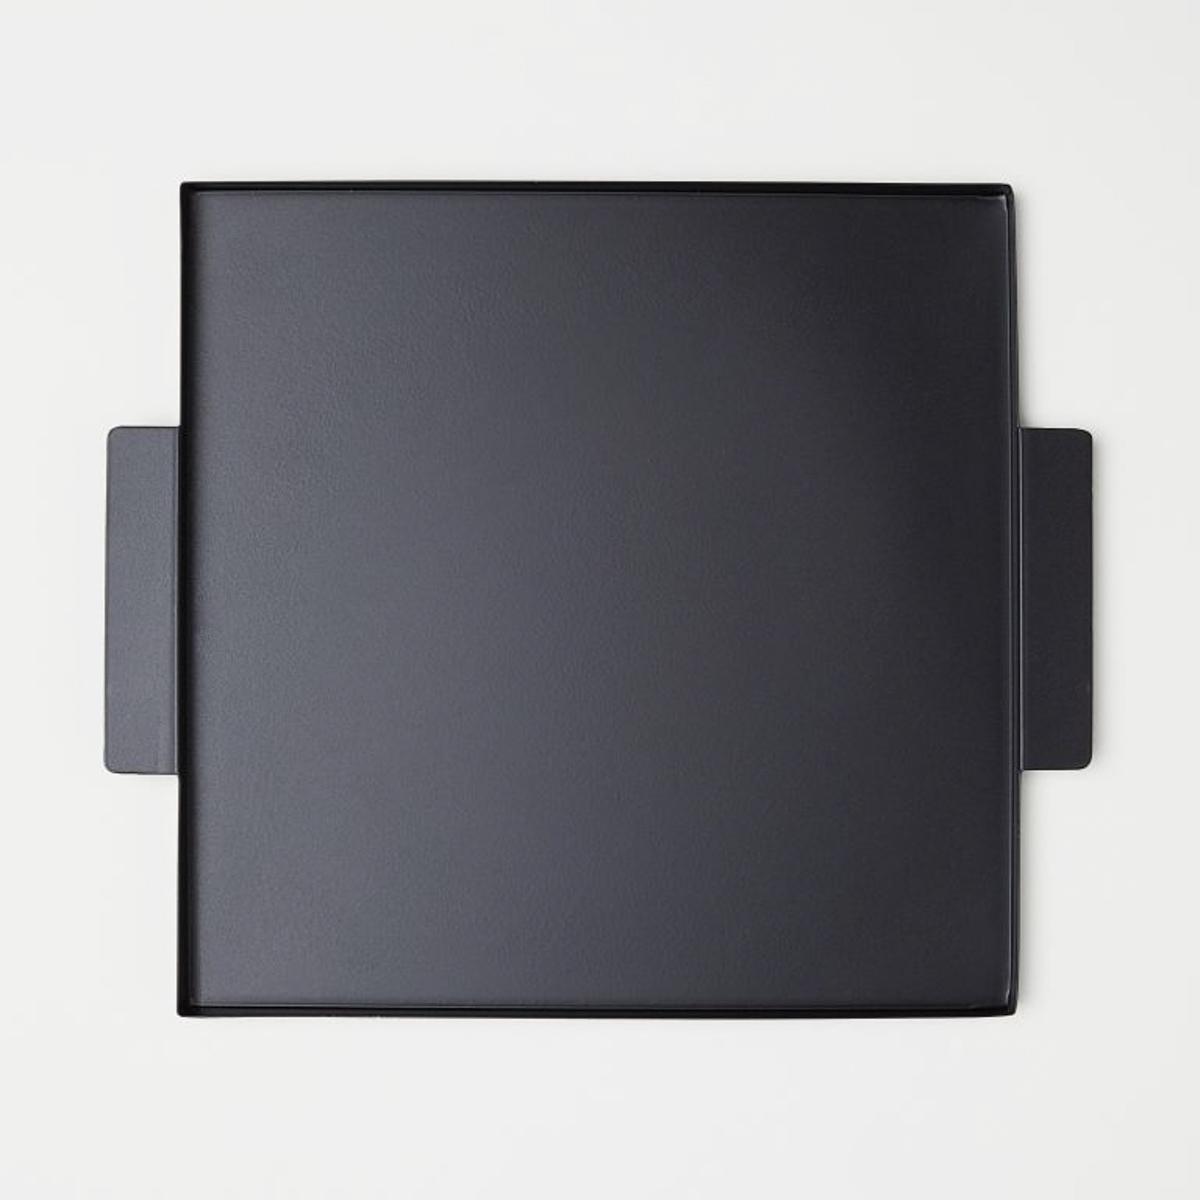 hm-black-metal-tray-storage-lifestyle-man-for-himself